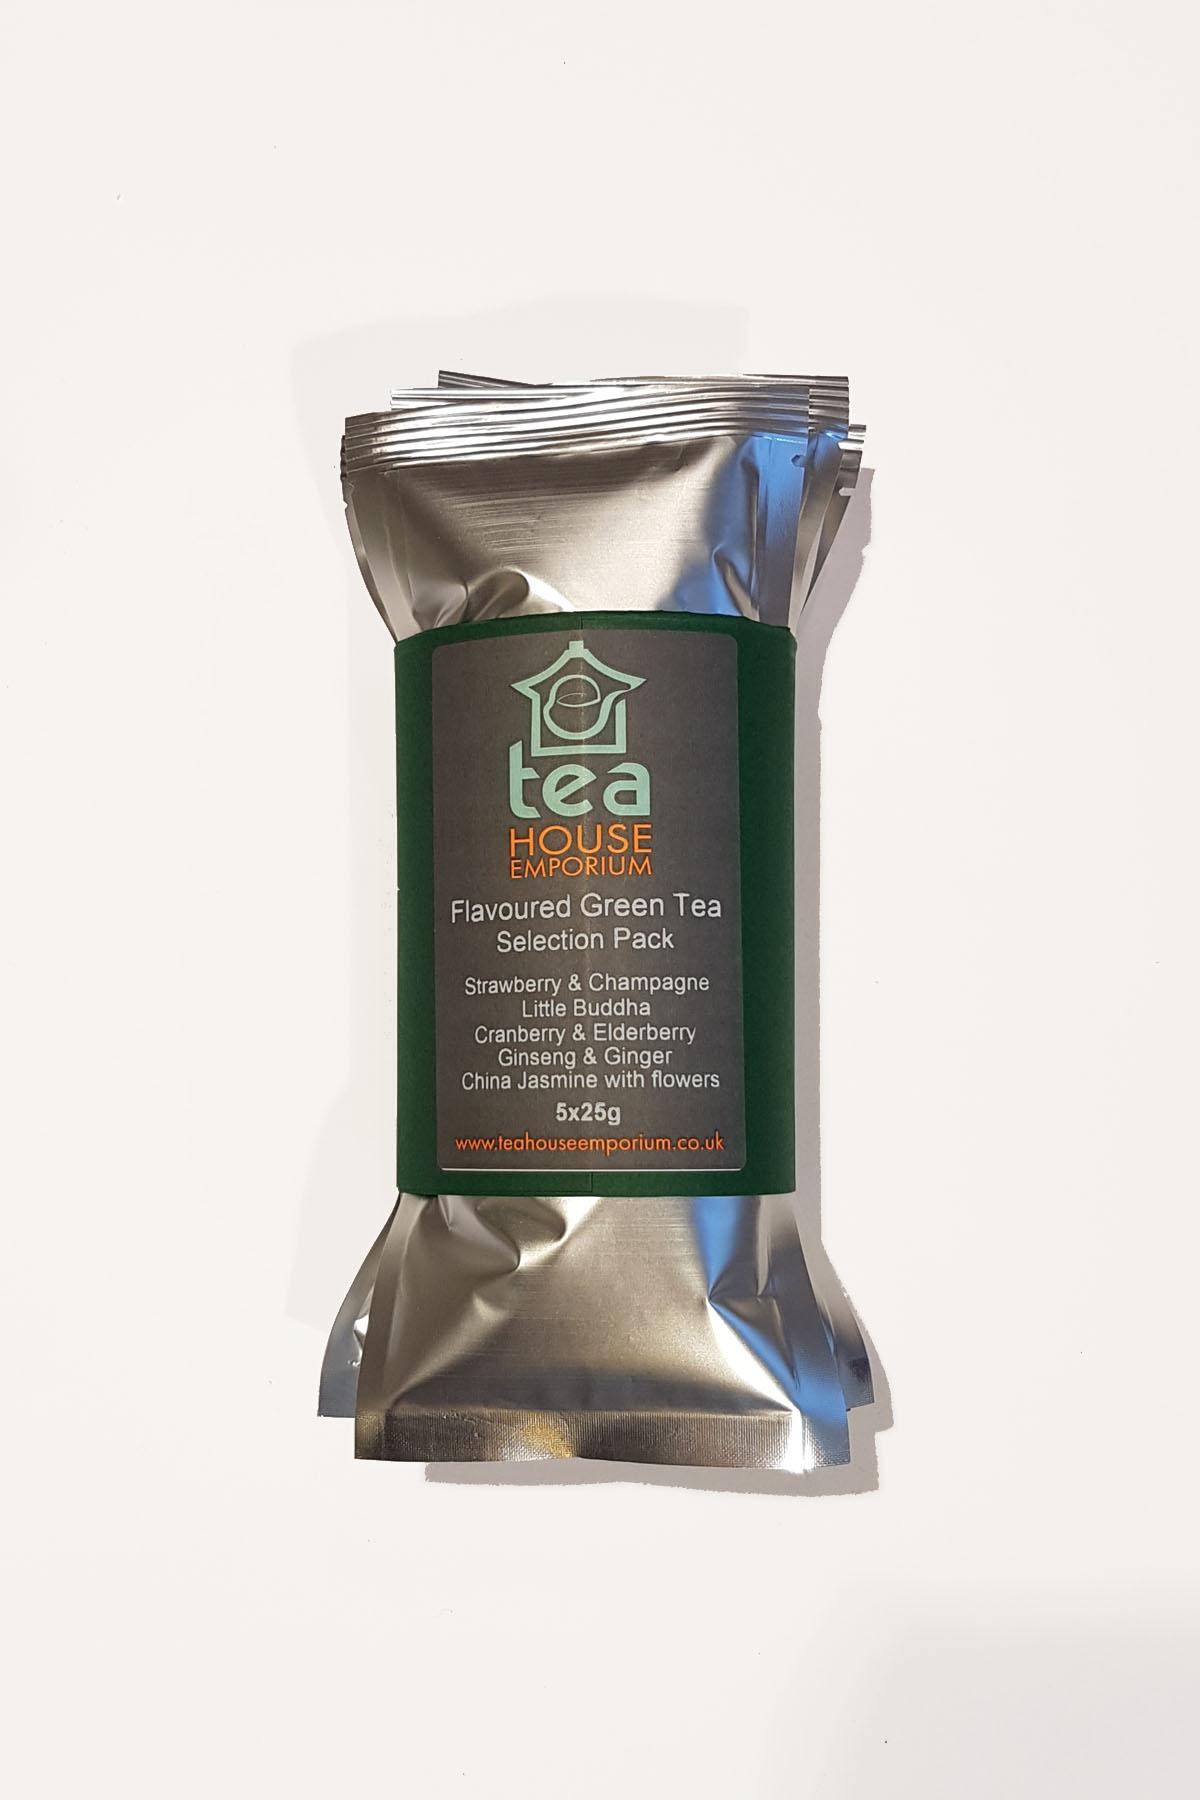 Flavoured Green Tea Selection Pack - Tea House Emporium